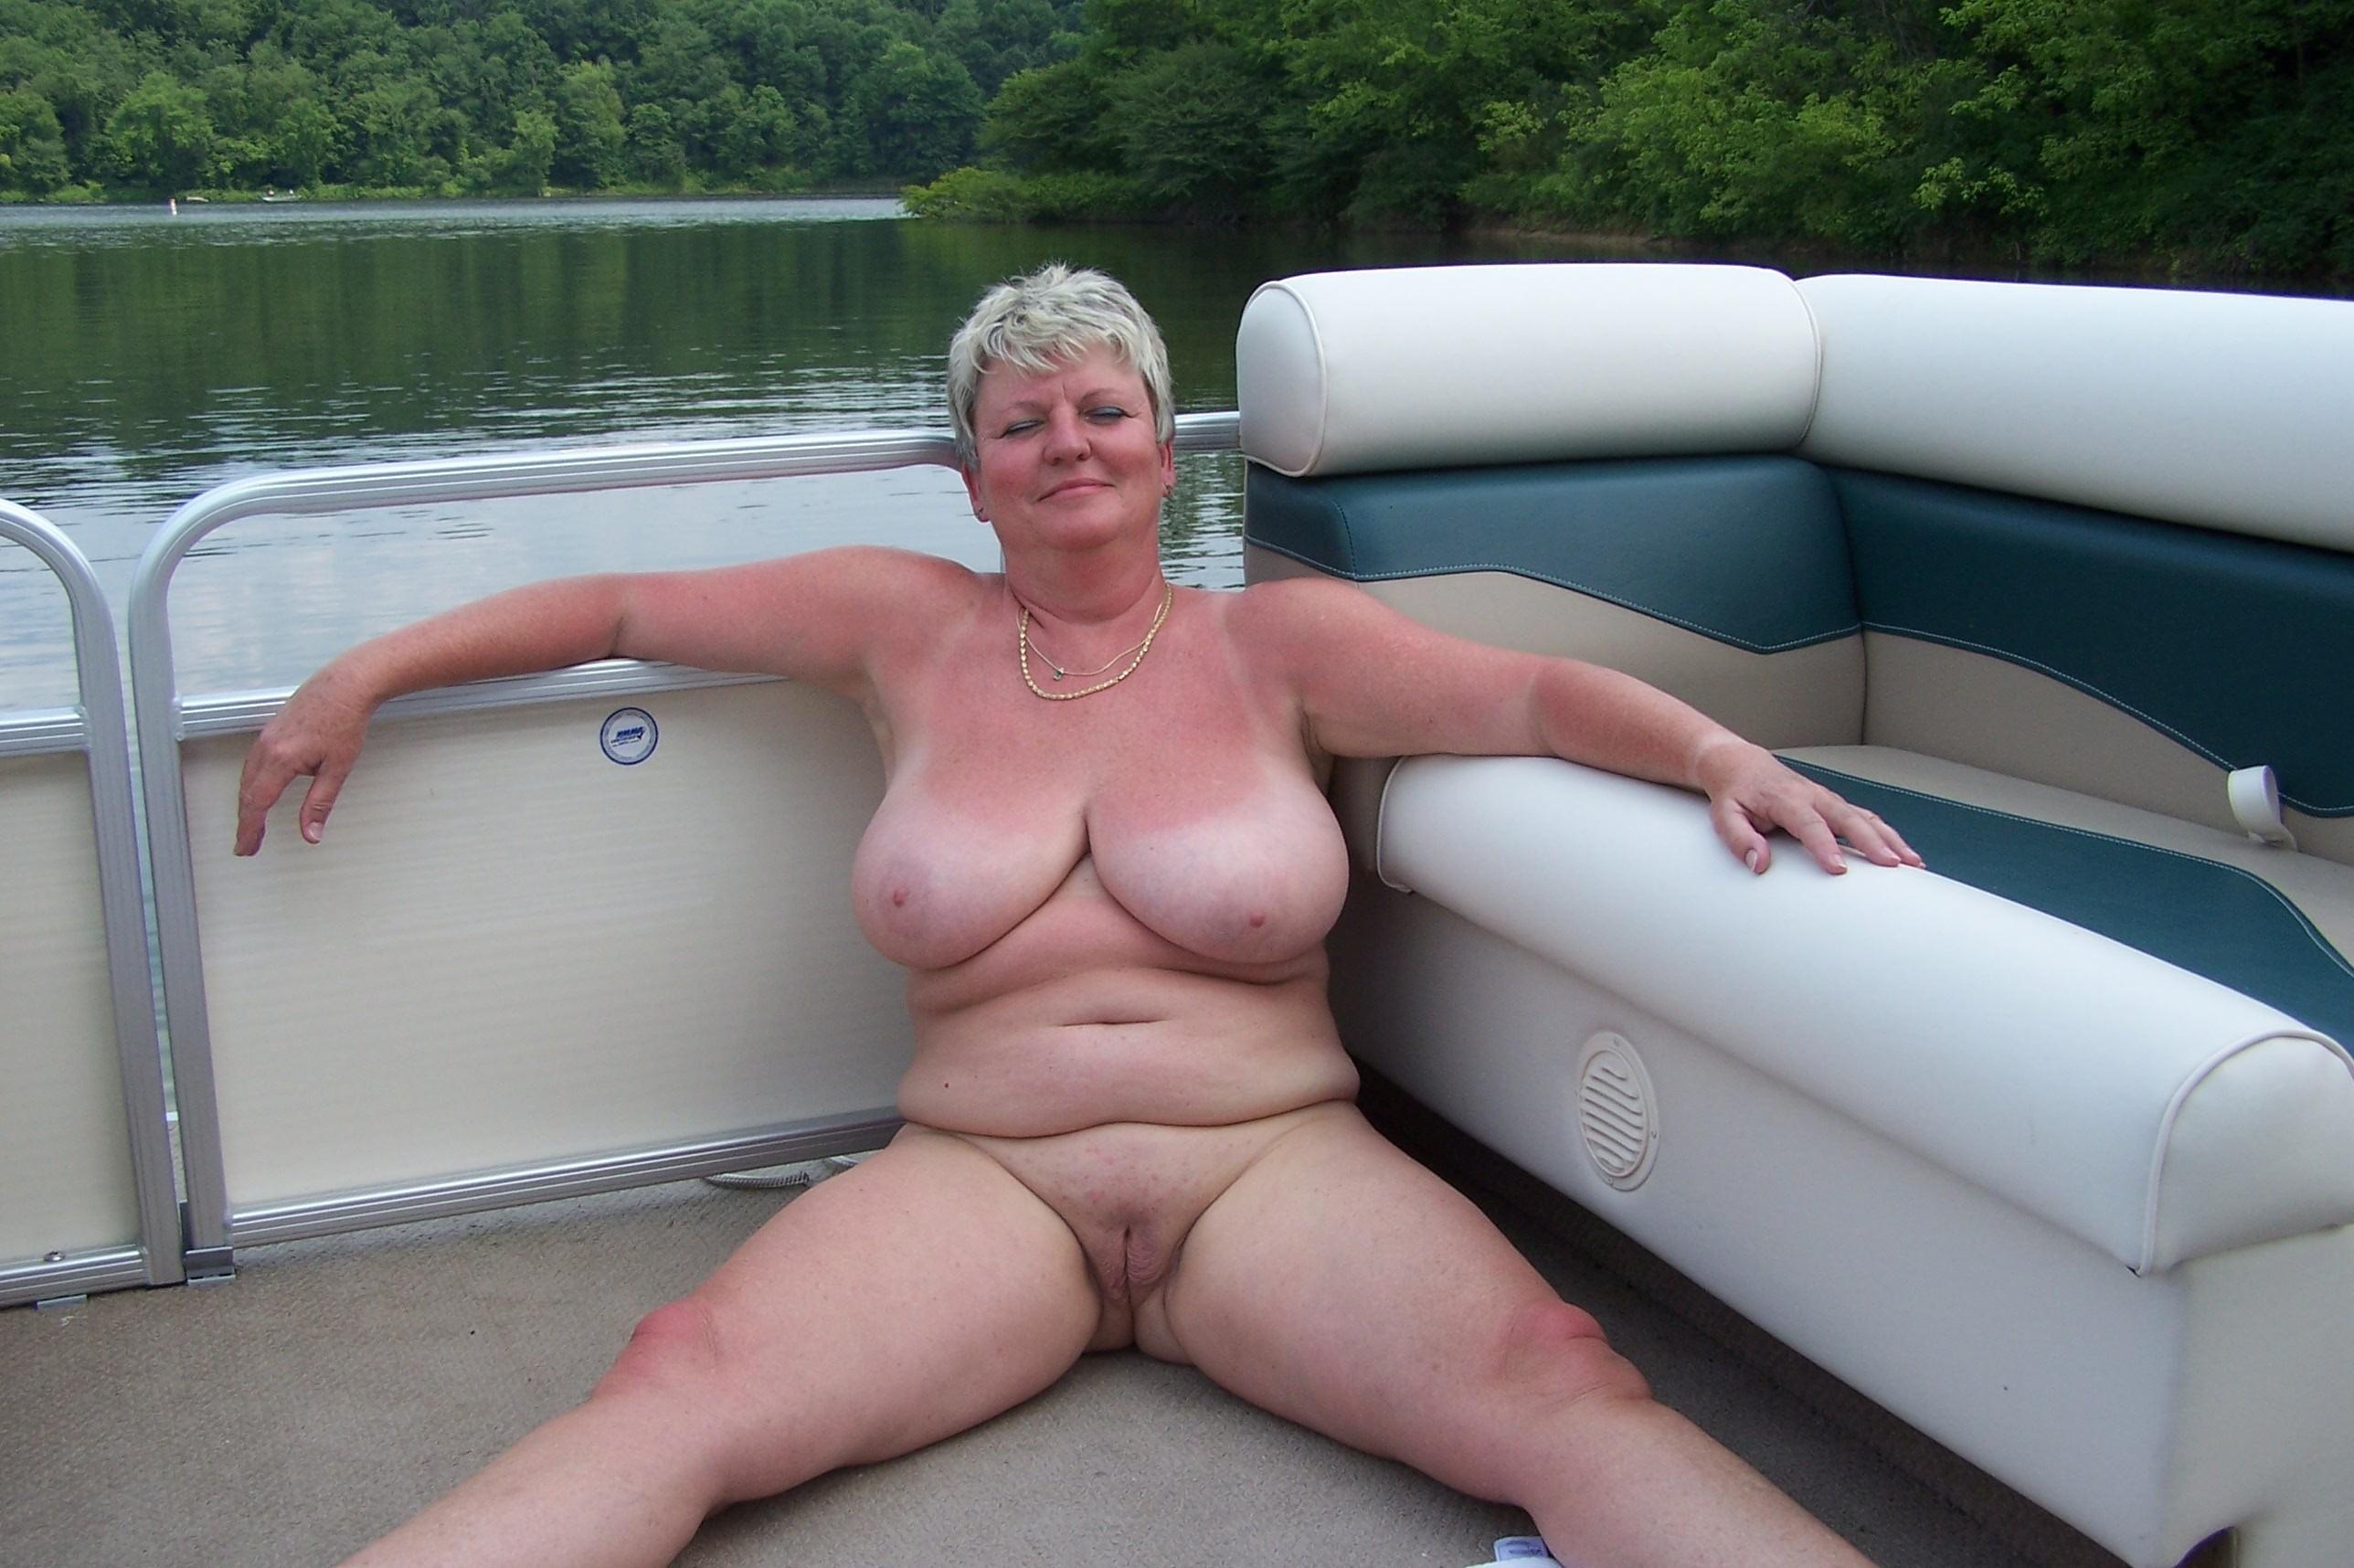 Nude Mature Women Photos Mature Nude Porn Women Photo Some